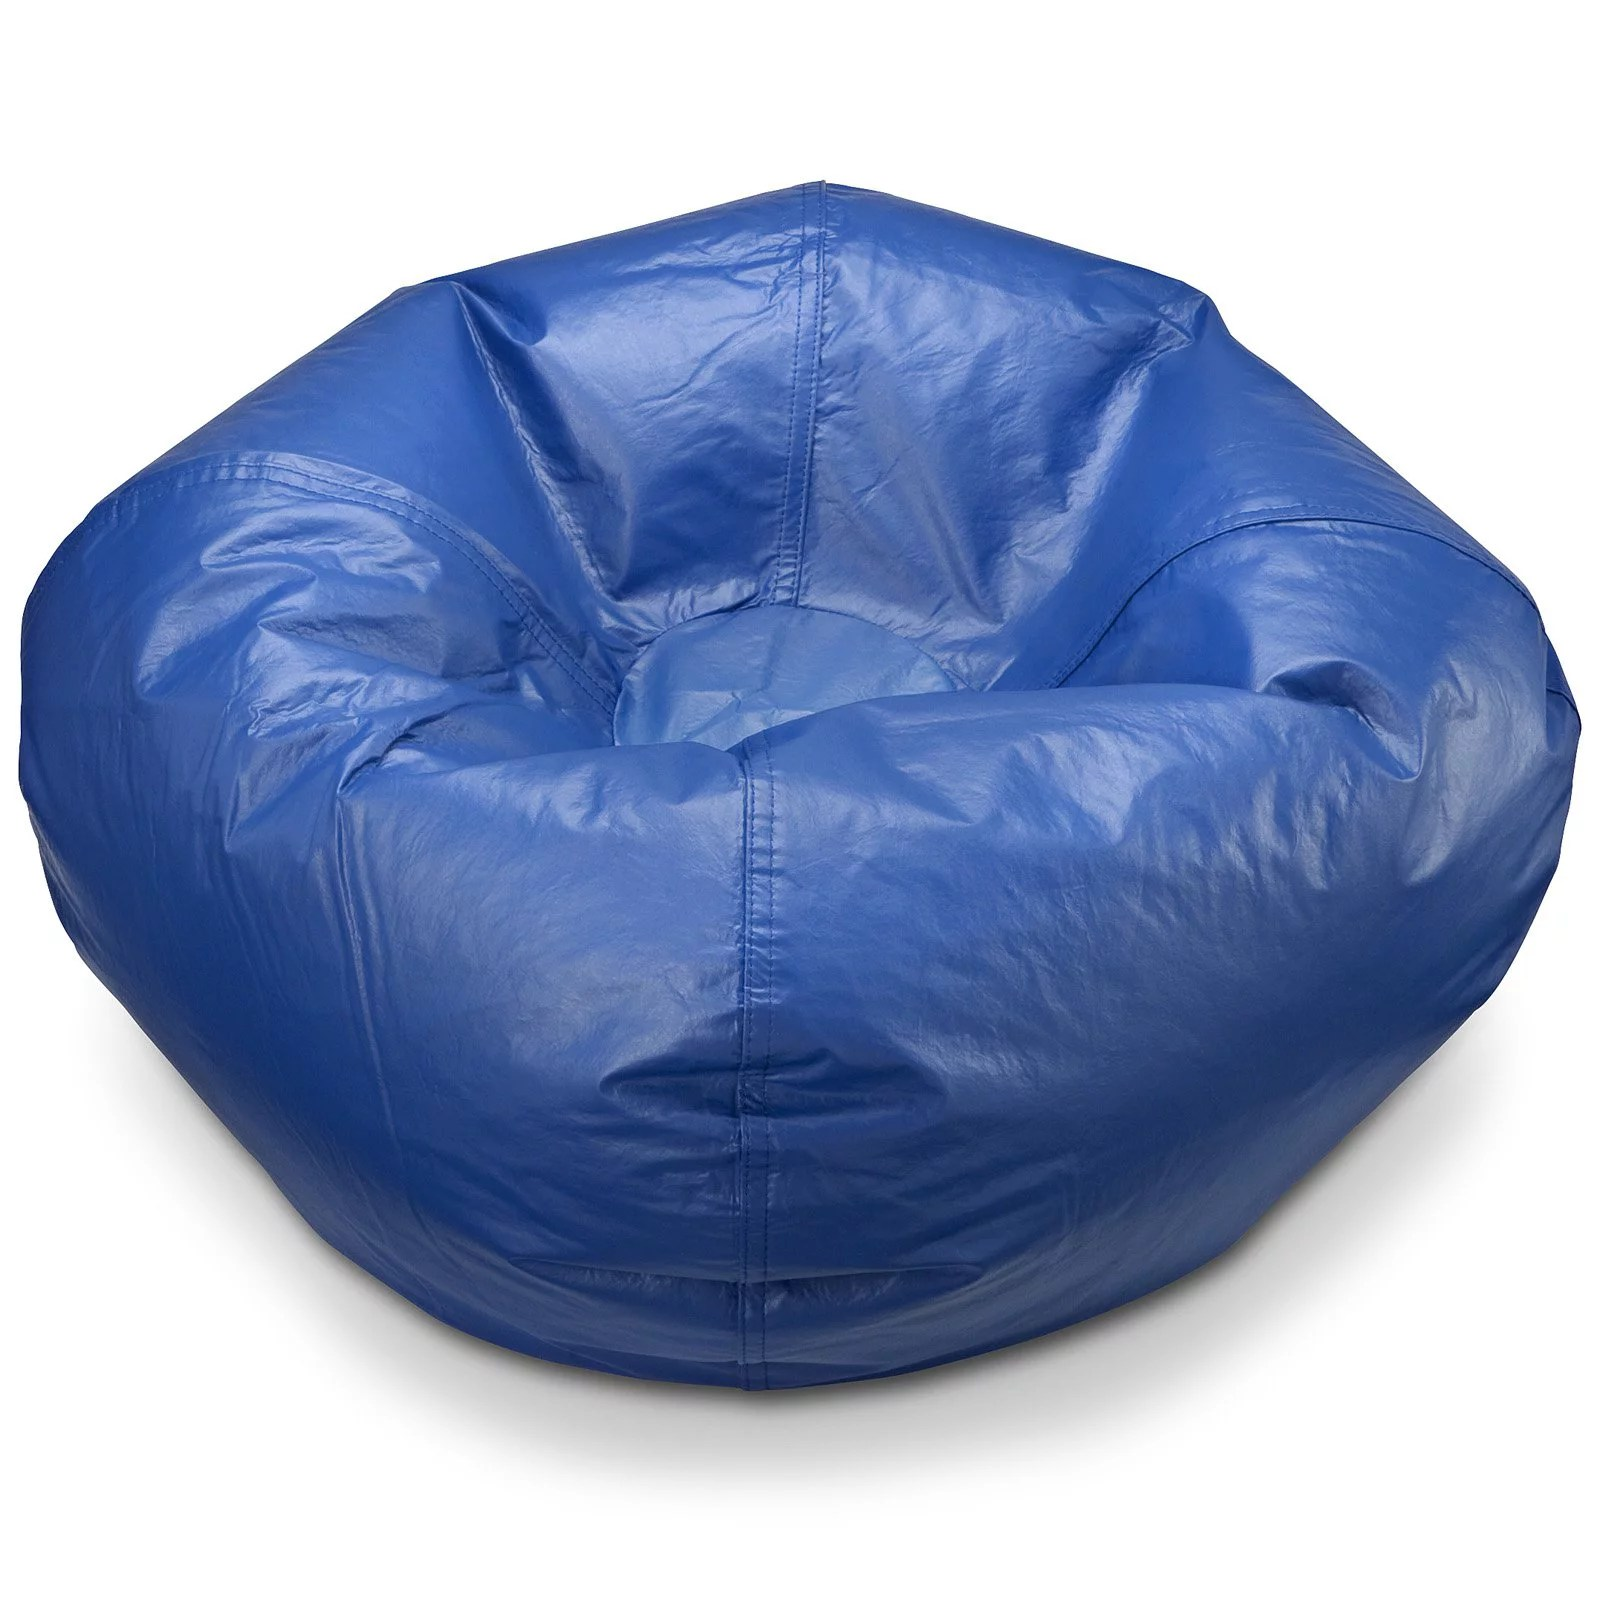 Small Standard Vinyl Bean Bag Chair